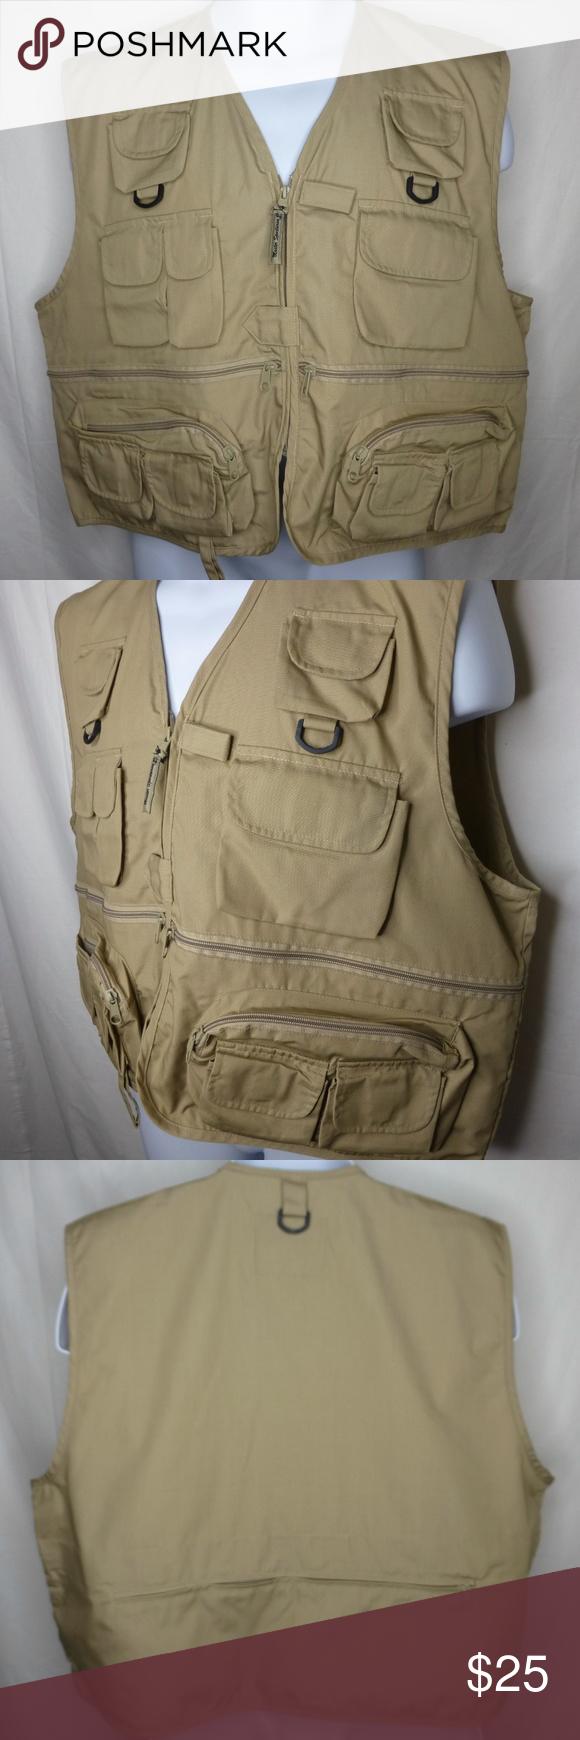 422eeddf651fbd Photographer Hunting Fishing Tactical Vest Men s XL Multi Pocket Vest  Safari Photographer Cargo Hunting Fishing Tactical